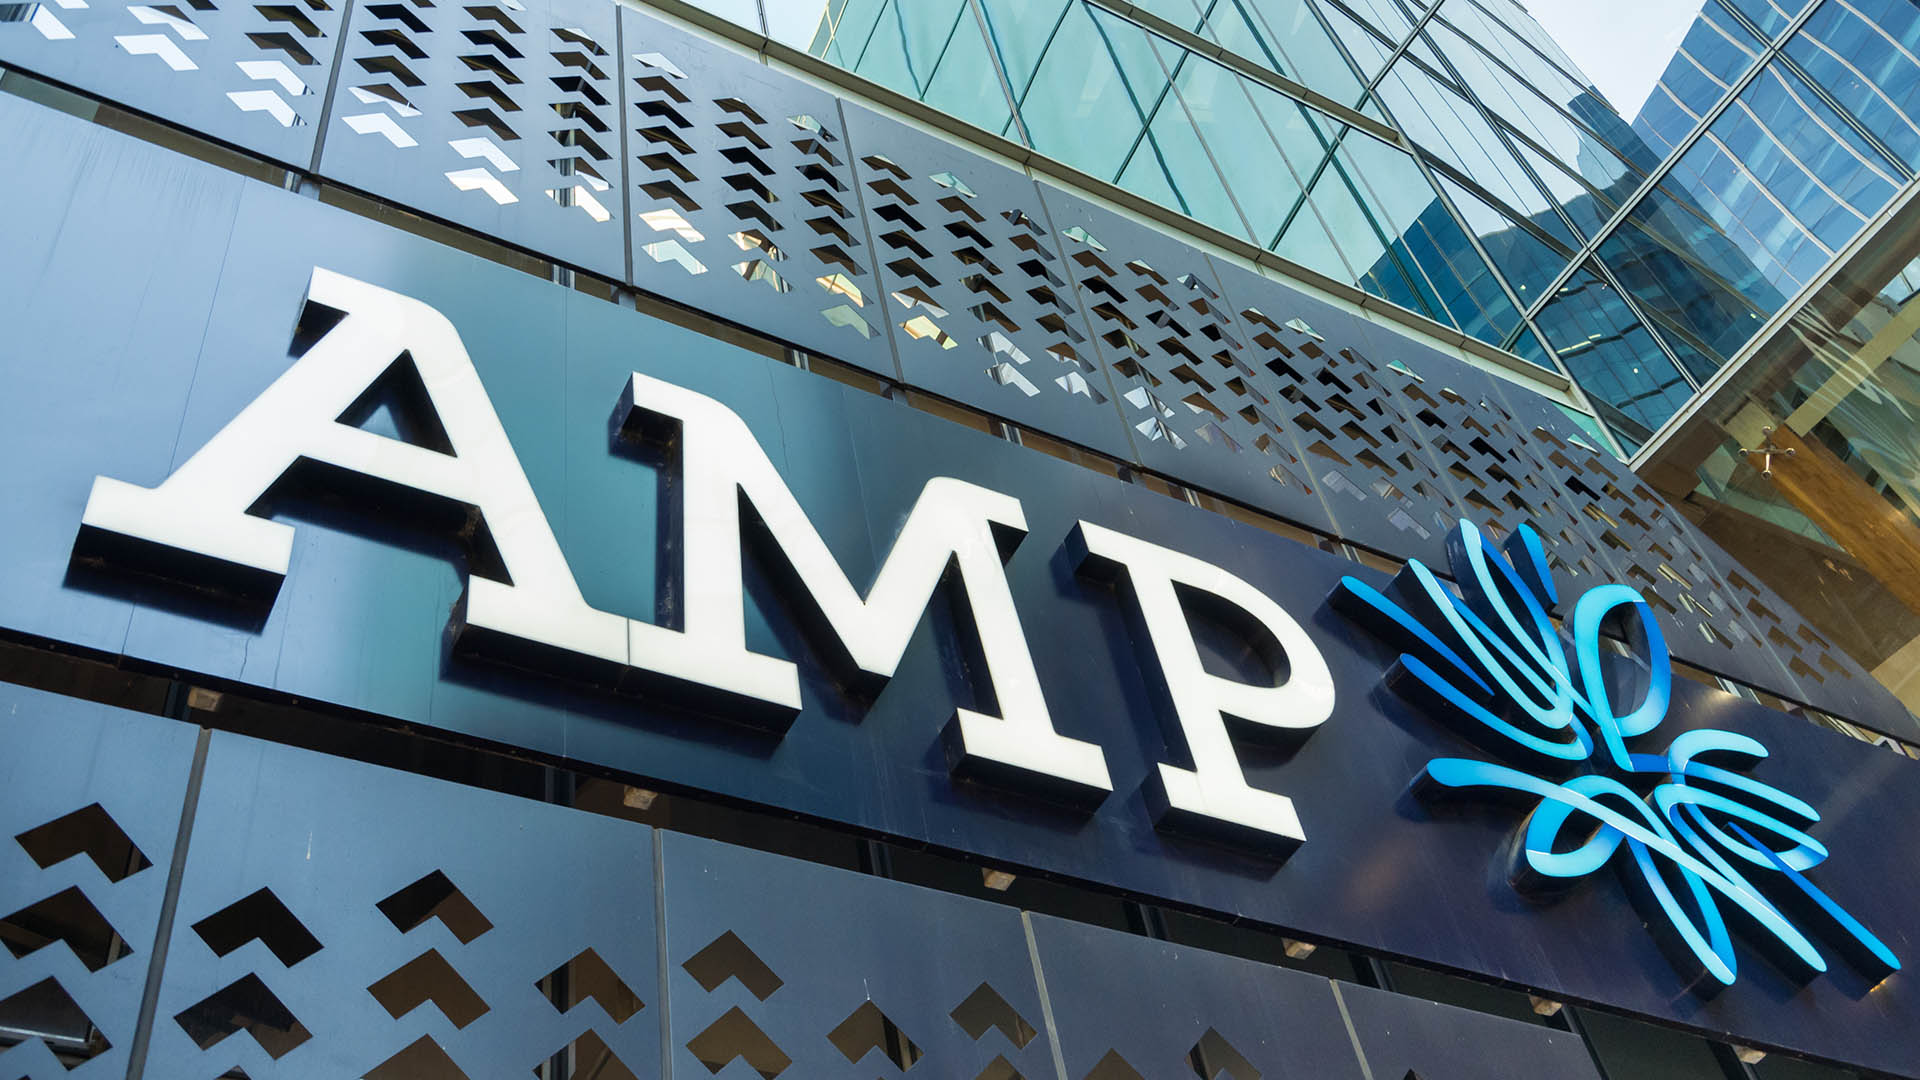 Alex Wade, CEO of AMP Australia (ASX:AMP), has left his role